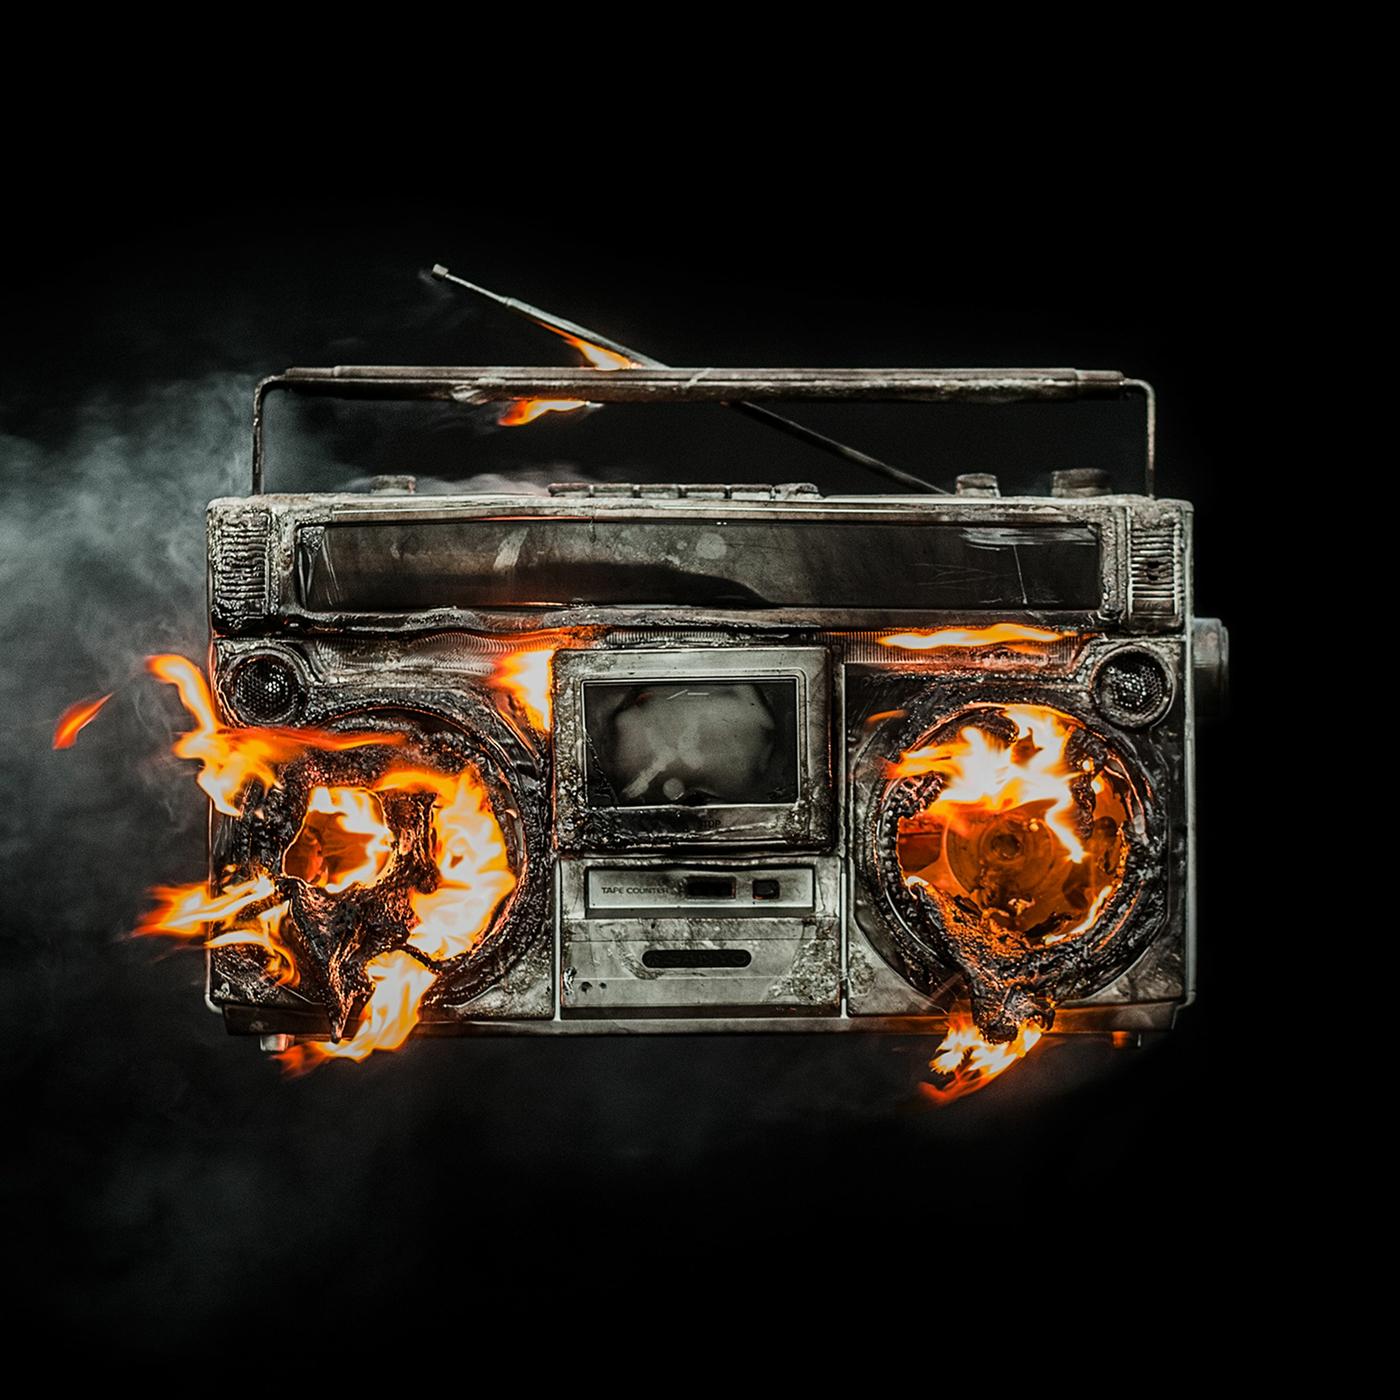 Green Day - Revolution Radio [single] (2016)